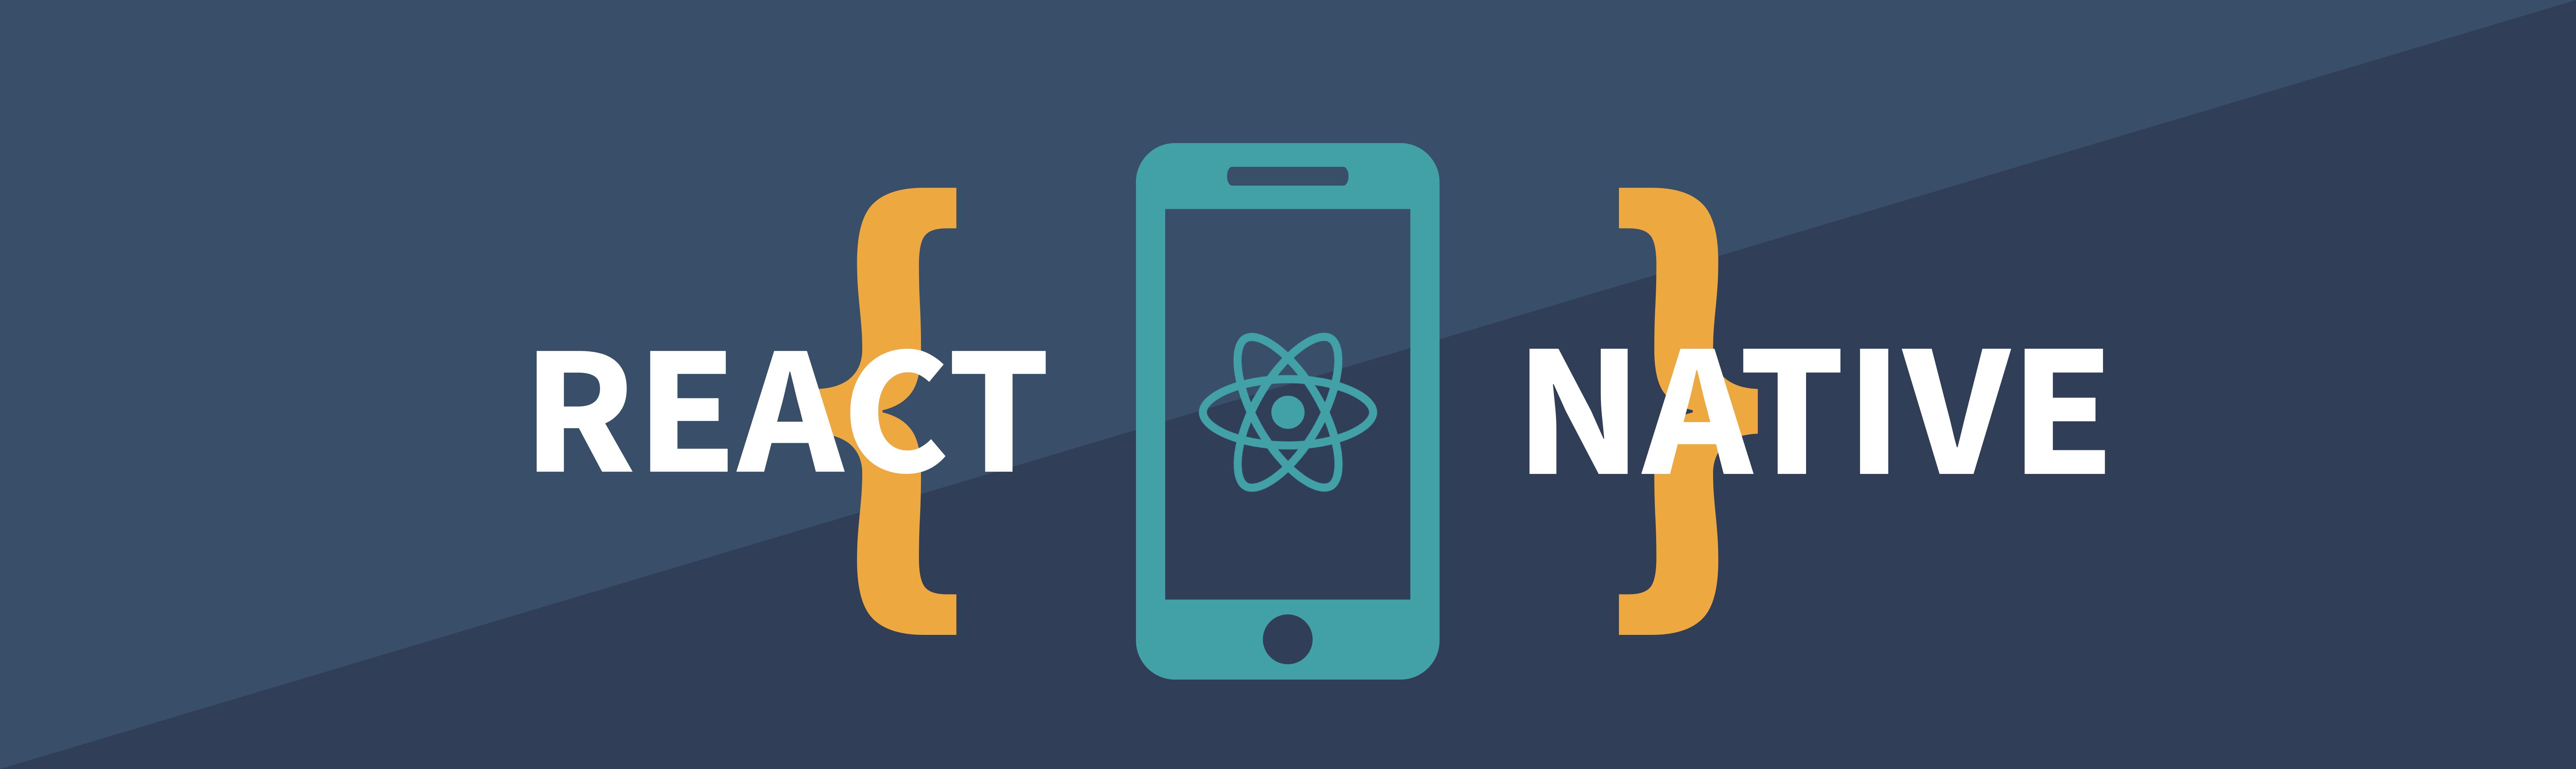 React Native development companies